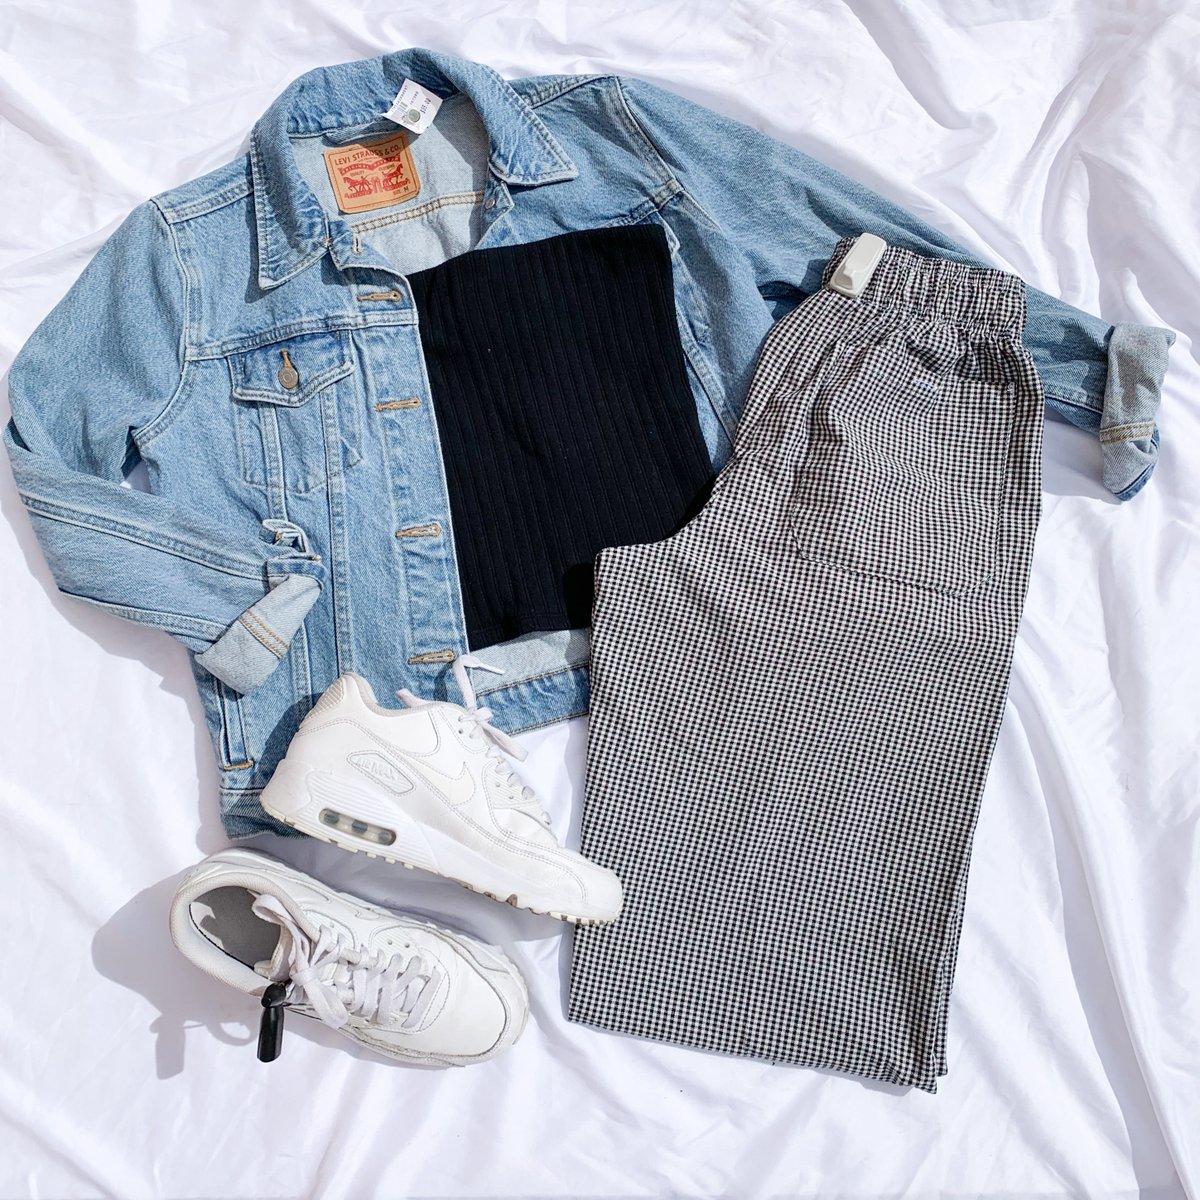 Street Style  Levi Women's Denim Jacket: M $35 American Eagle Tube Top: M $10  Women's Pants: S $14  Women's Nike Air Max Shoes: size 5 $30  #platosclosettemecula #nike #levi #trendystyles #streetstyle #thriftfinds #gentlyloved #platoscloset #fashioninspo